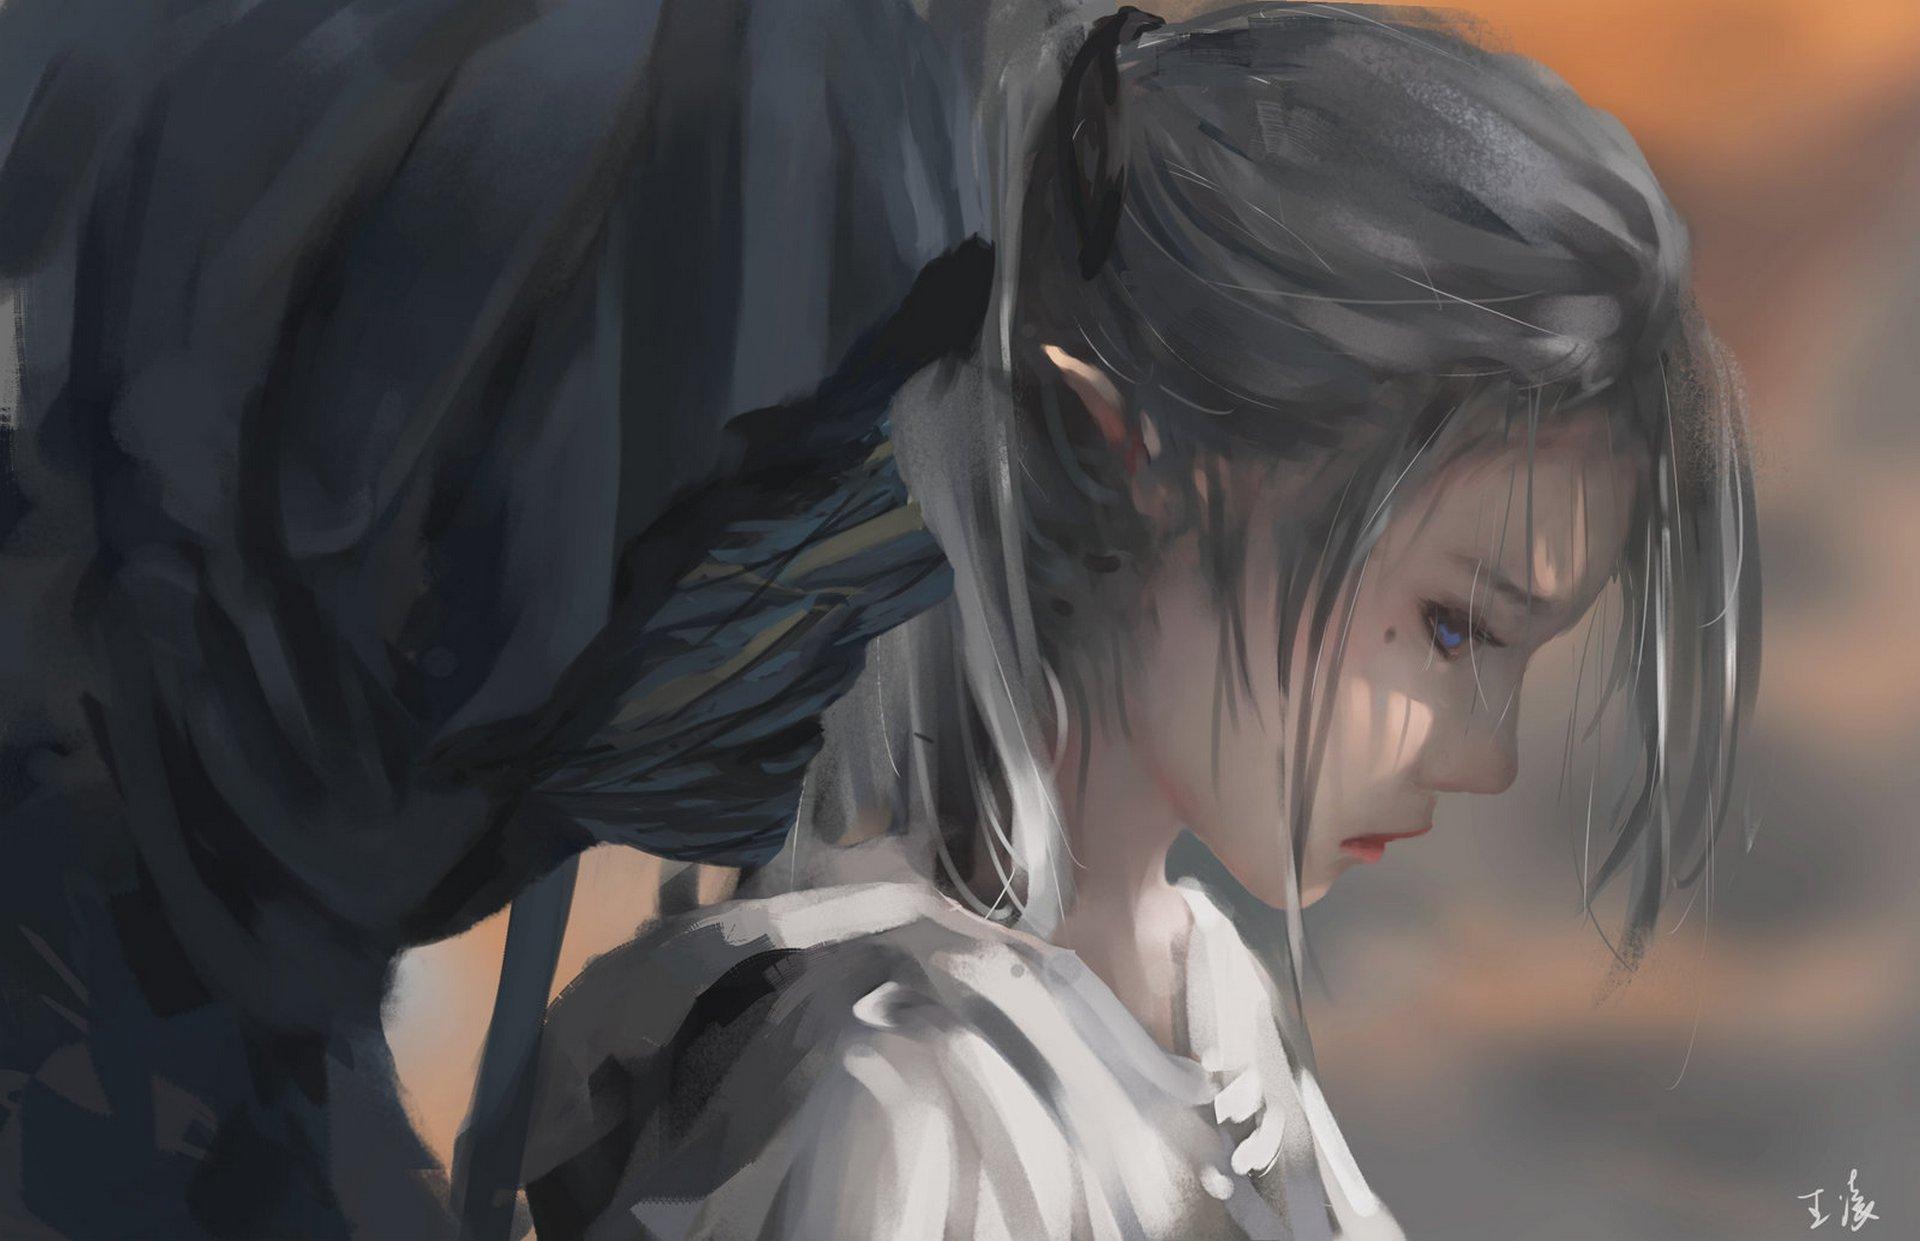 General 1920x1241 WLOP digital art artwork women white hair blue eyes pointy ears sadness long hair fantasy art elves